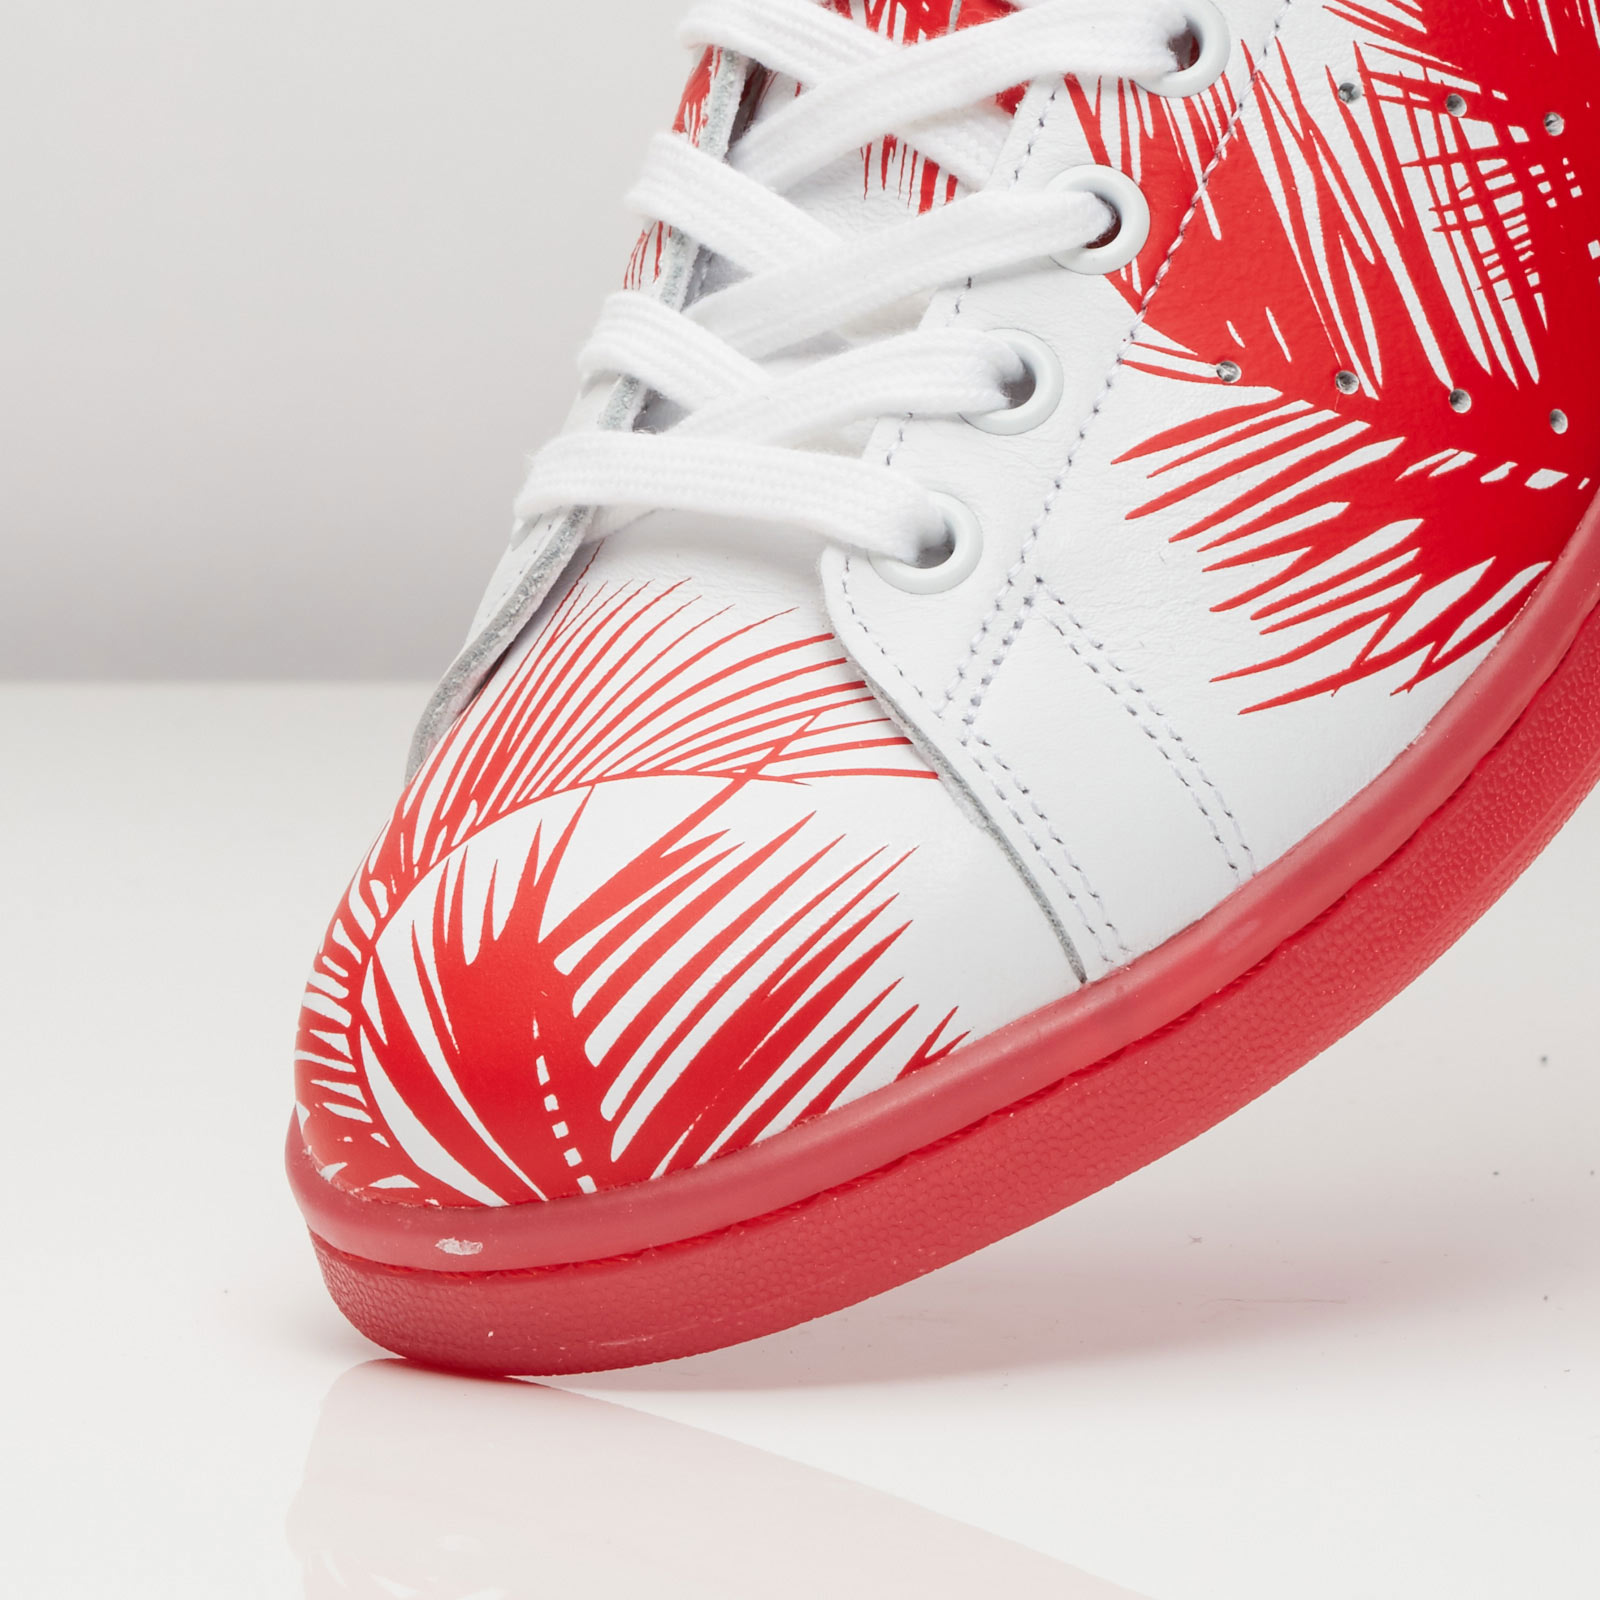 adidas PW Stan Smith BBC Palm Tree - S82072 - Sneakersnstuff ... 43cef1352